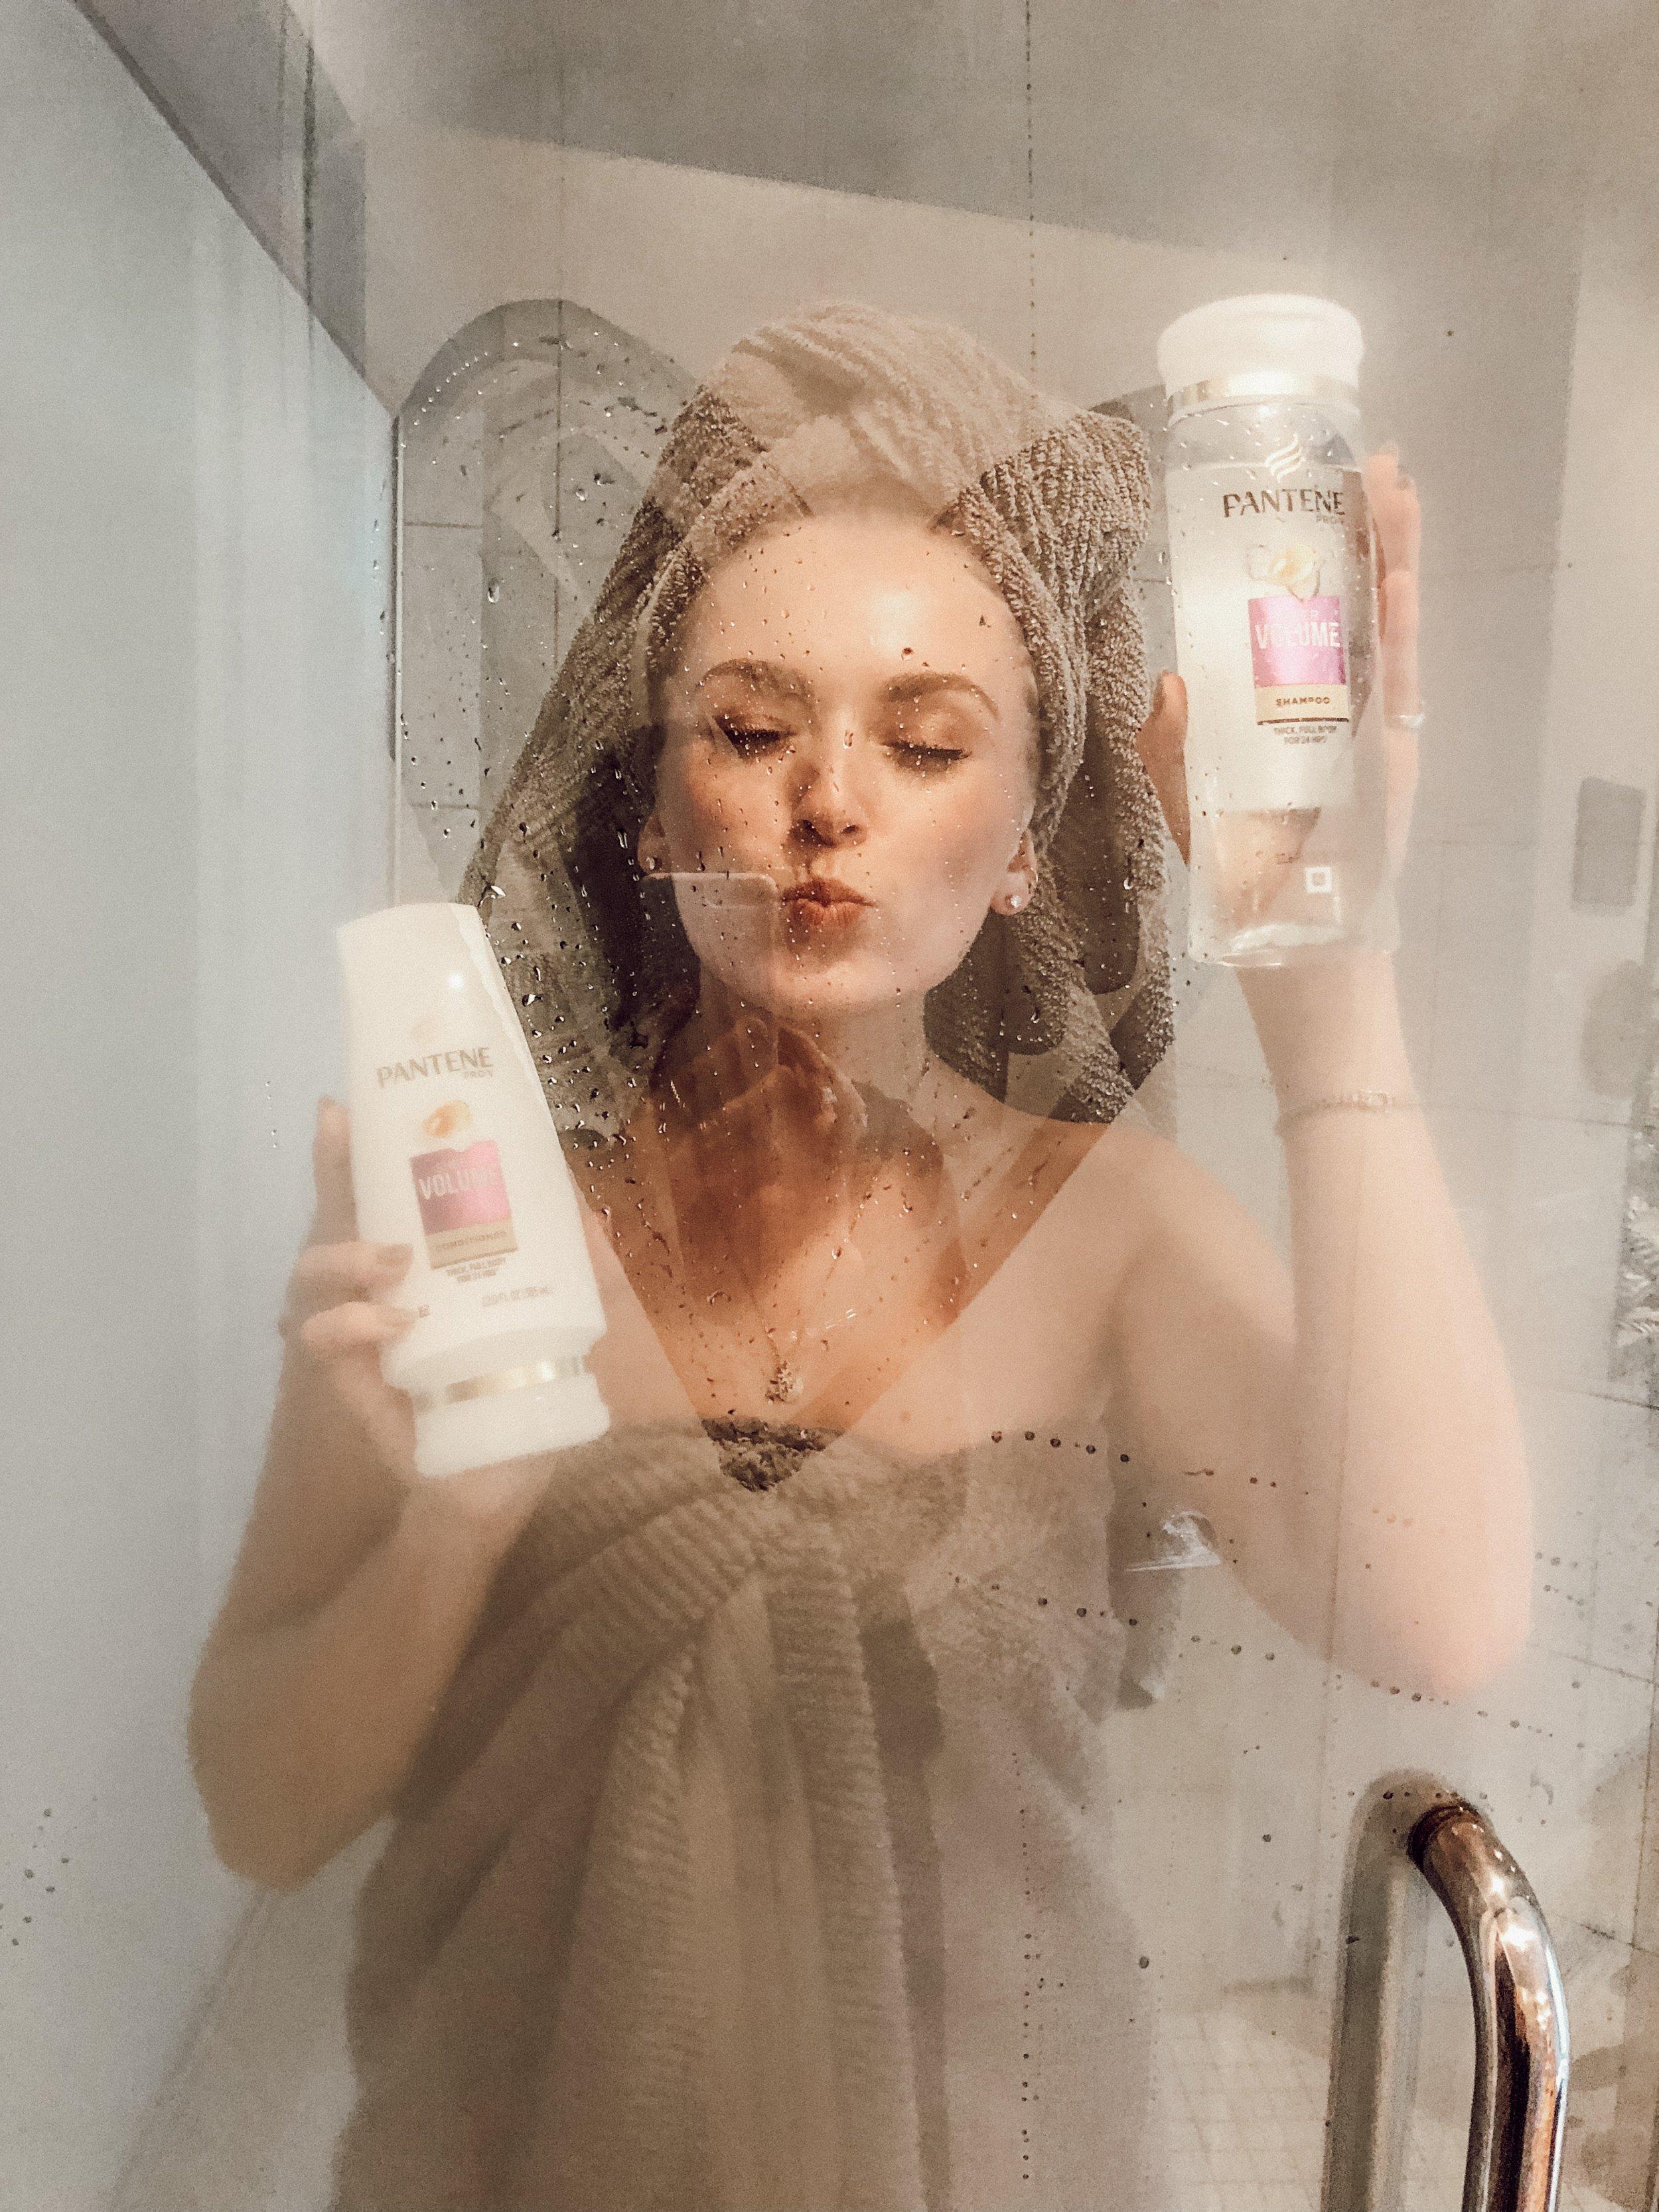 pantene sheer volume shampoo and conditioner